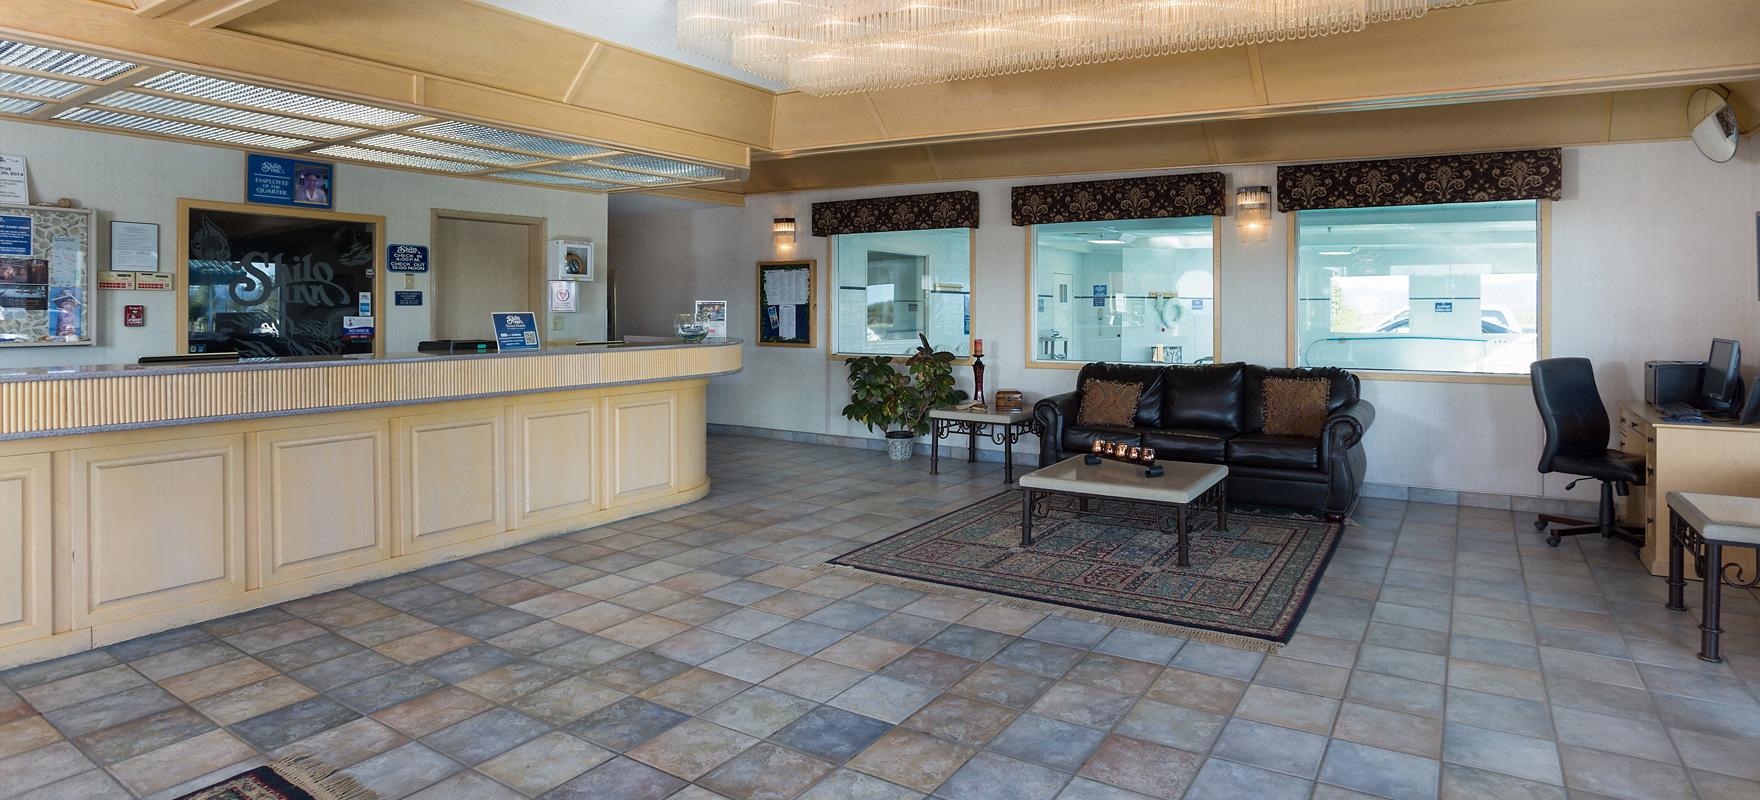 Shilo Inns Suites Hotels Warrenton Oregon